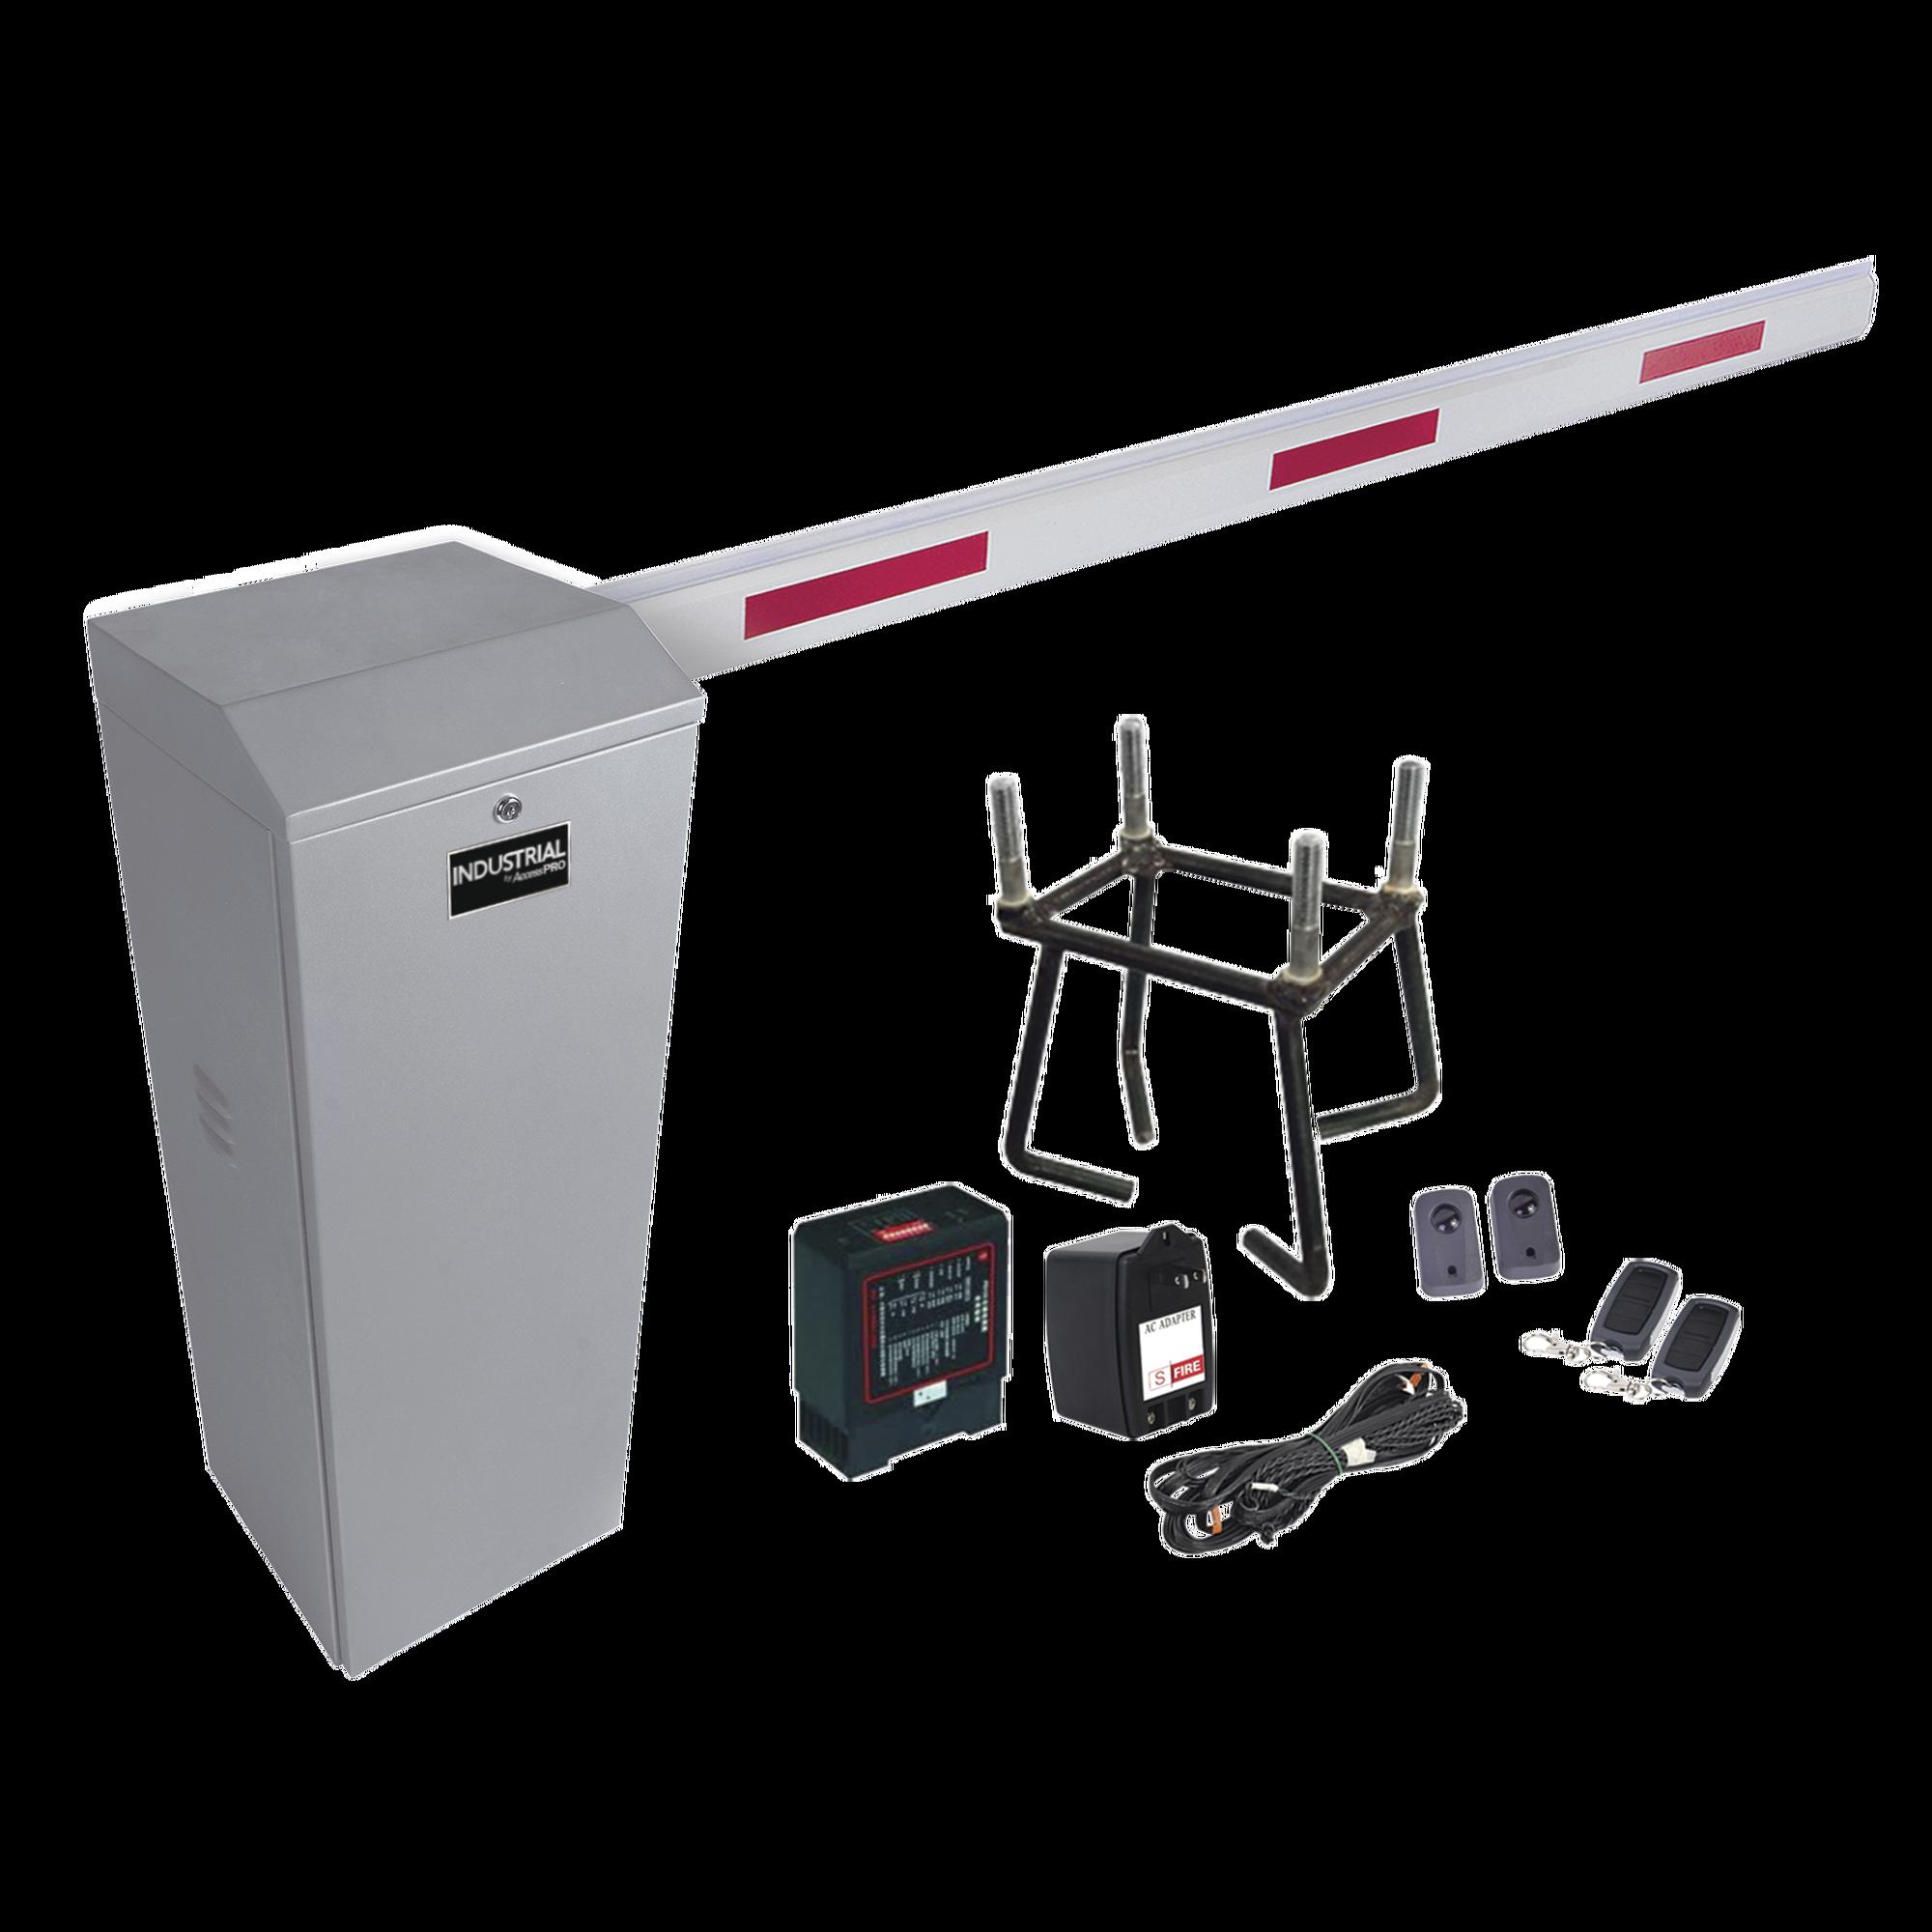 Kit COMPLETO Barrera Derecha XB / 3M / Incluye Sensor de masa, Transformador, Lazo, Ancla, Fotoceldas 2 Controles Inalámbricos